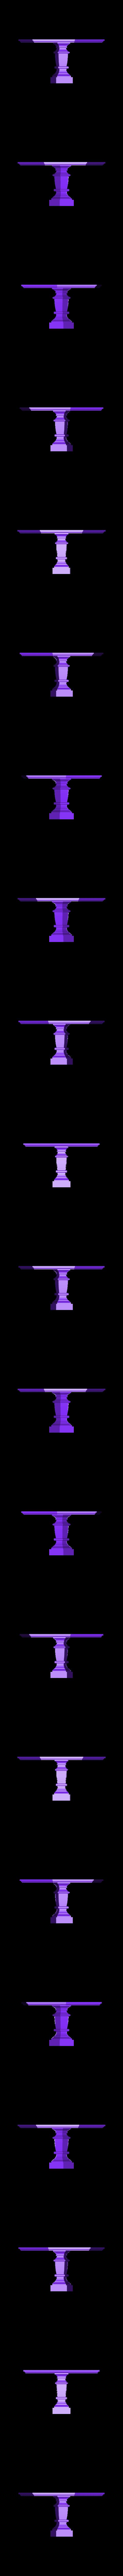 table octogonale2.stl Download STL file hexagonal table • 3D printable model, remus59